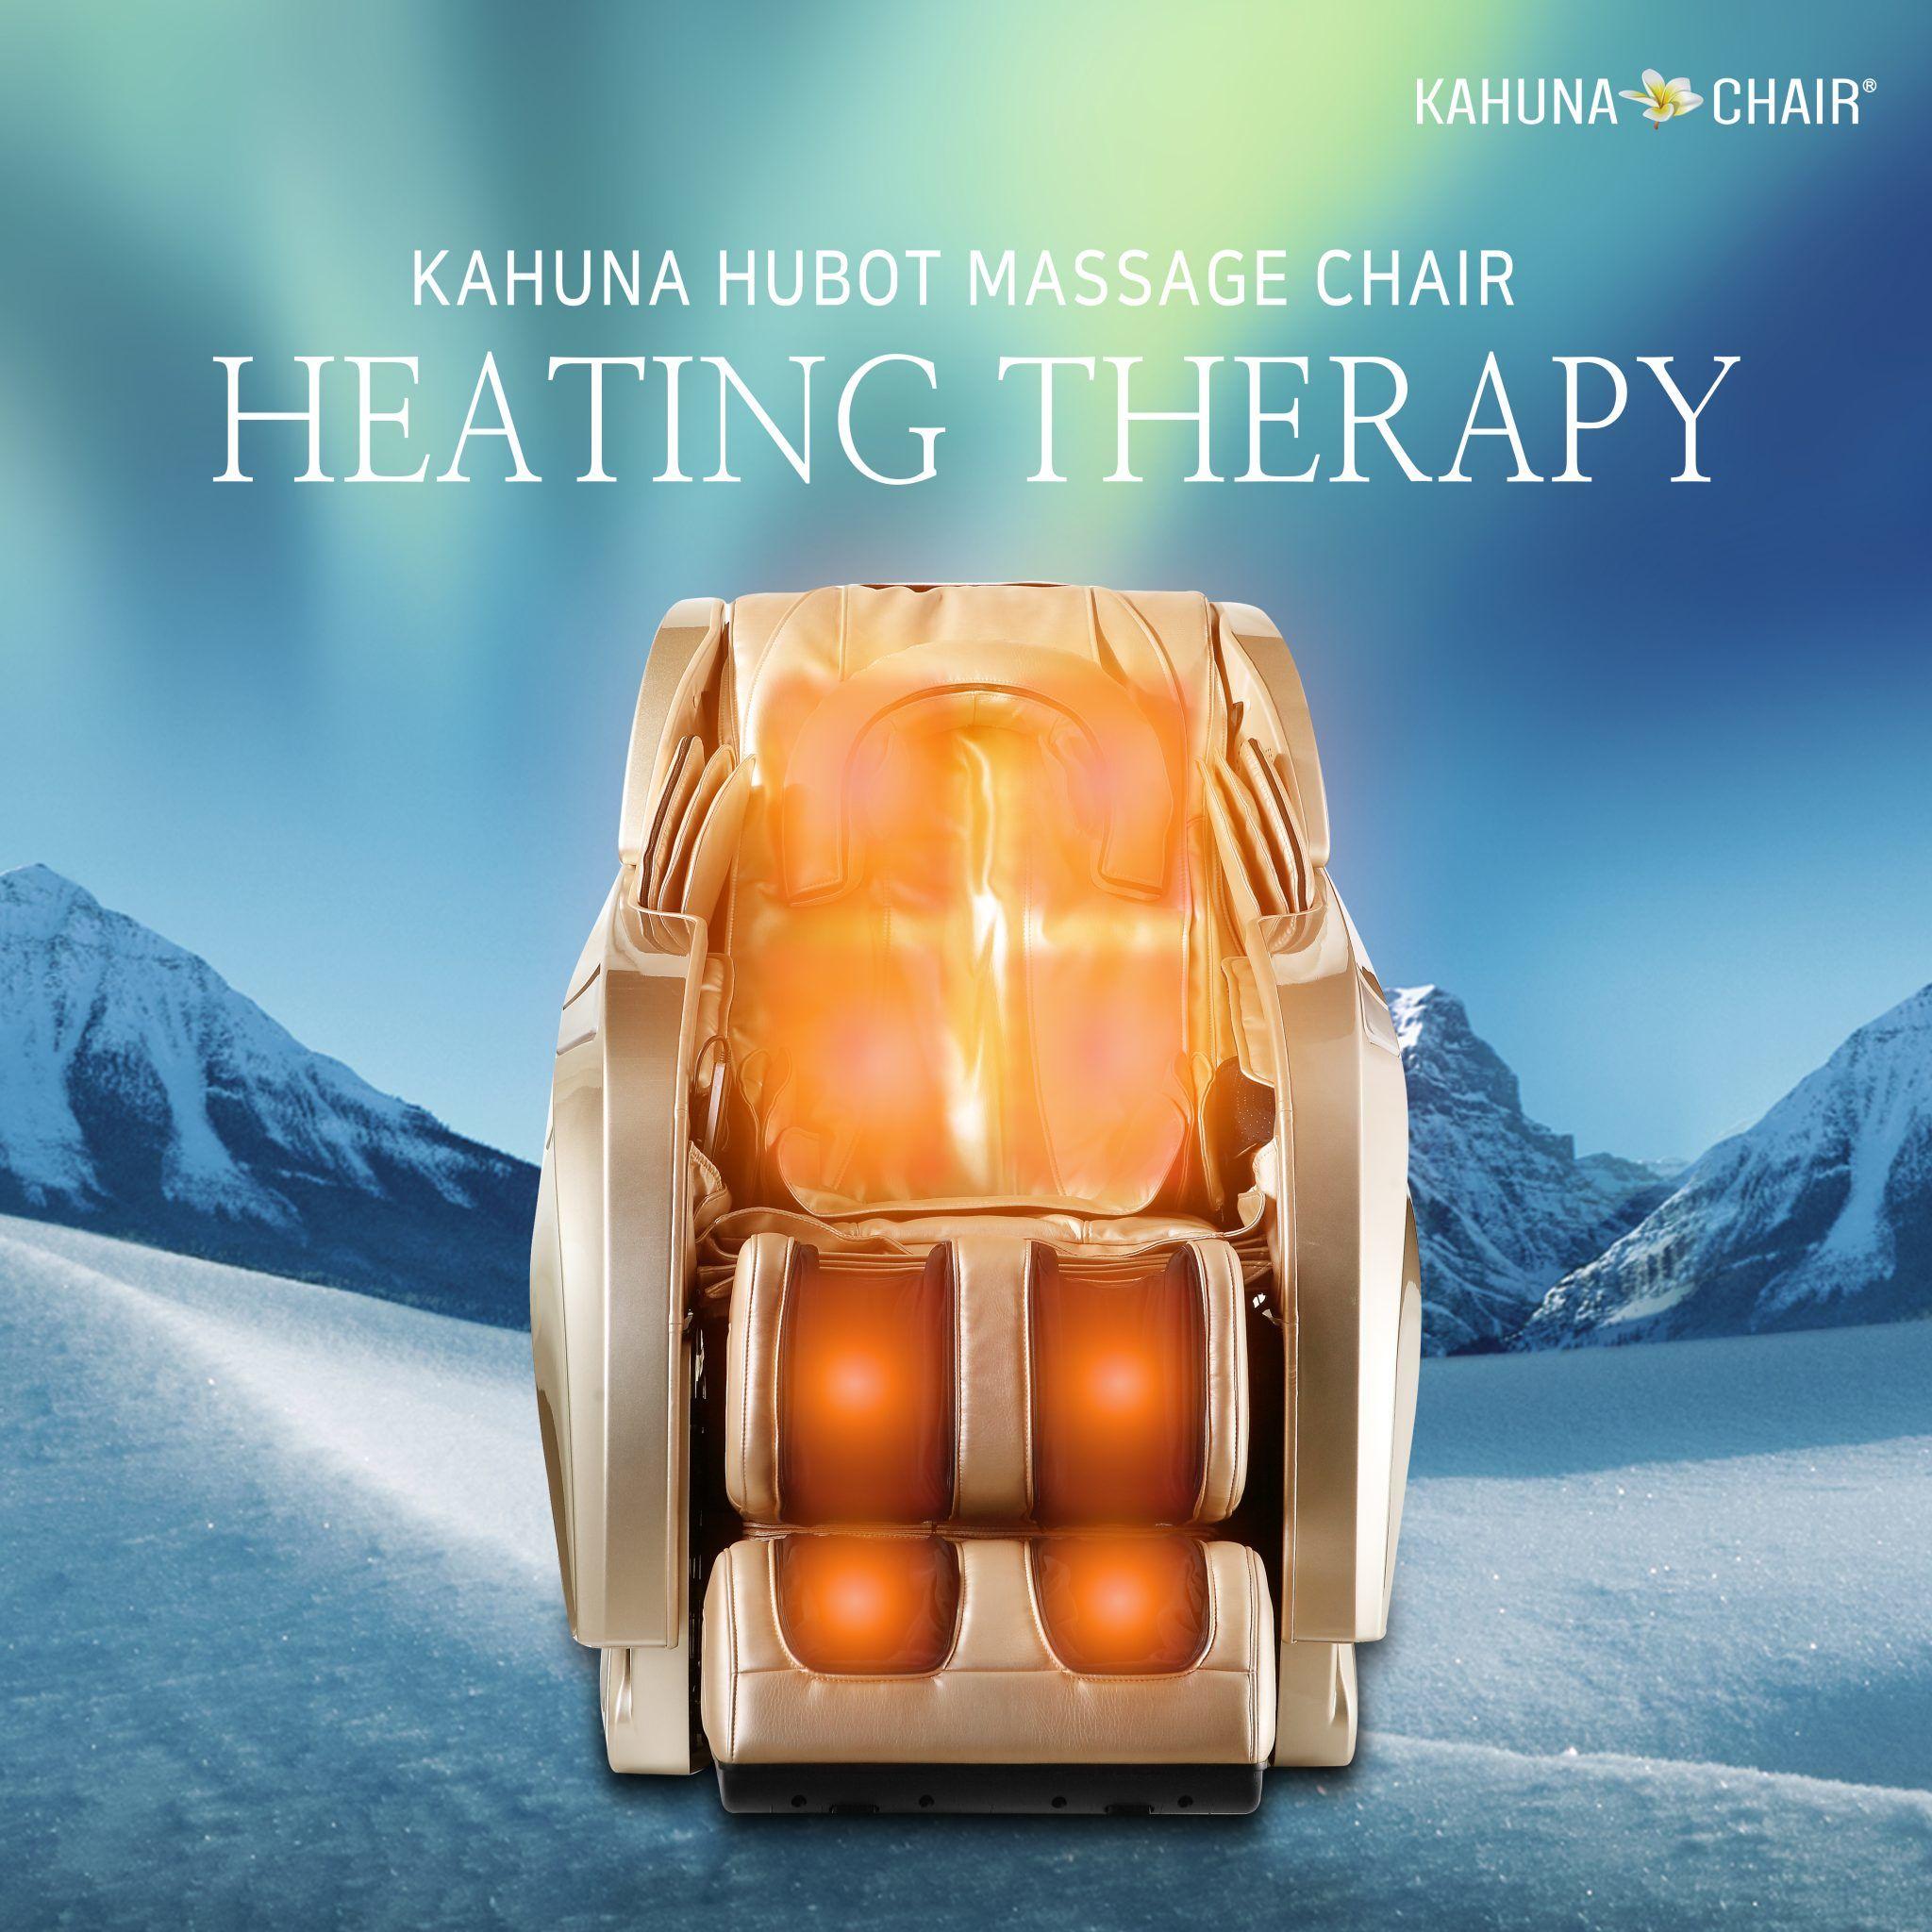 Kahuna Hubot HM-078 Heat Therapy